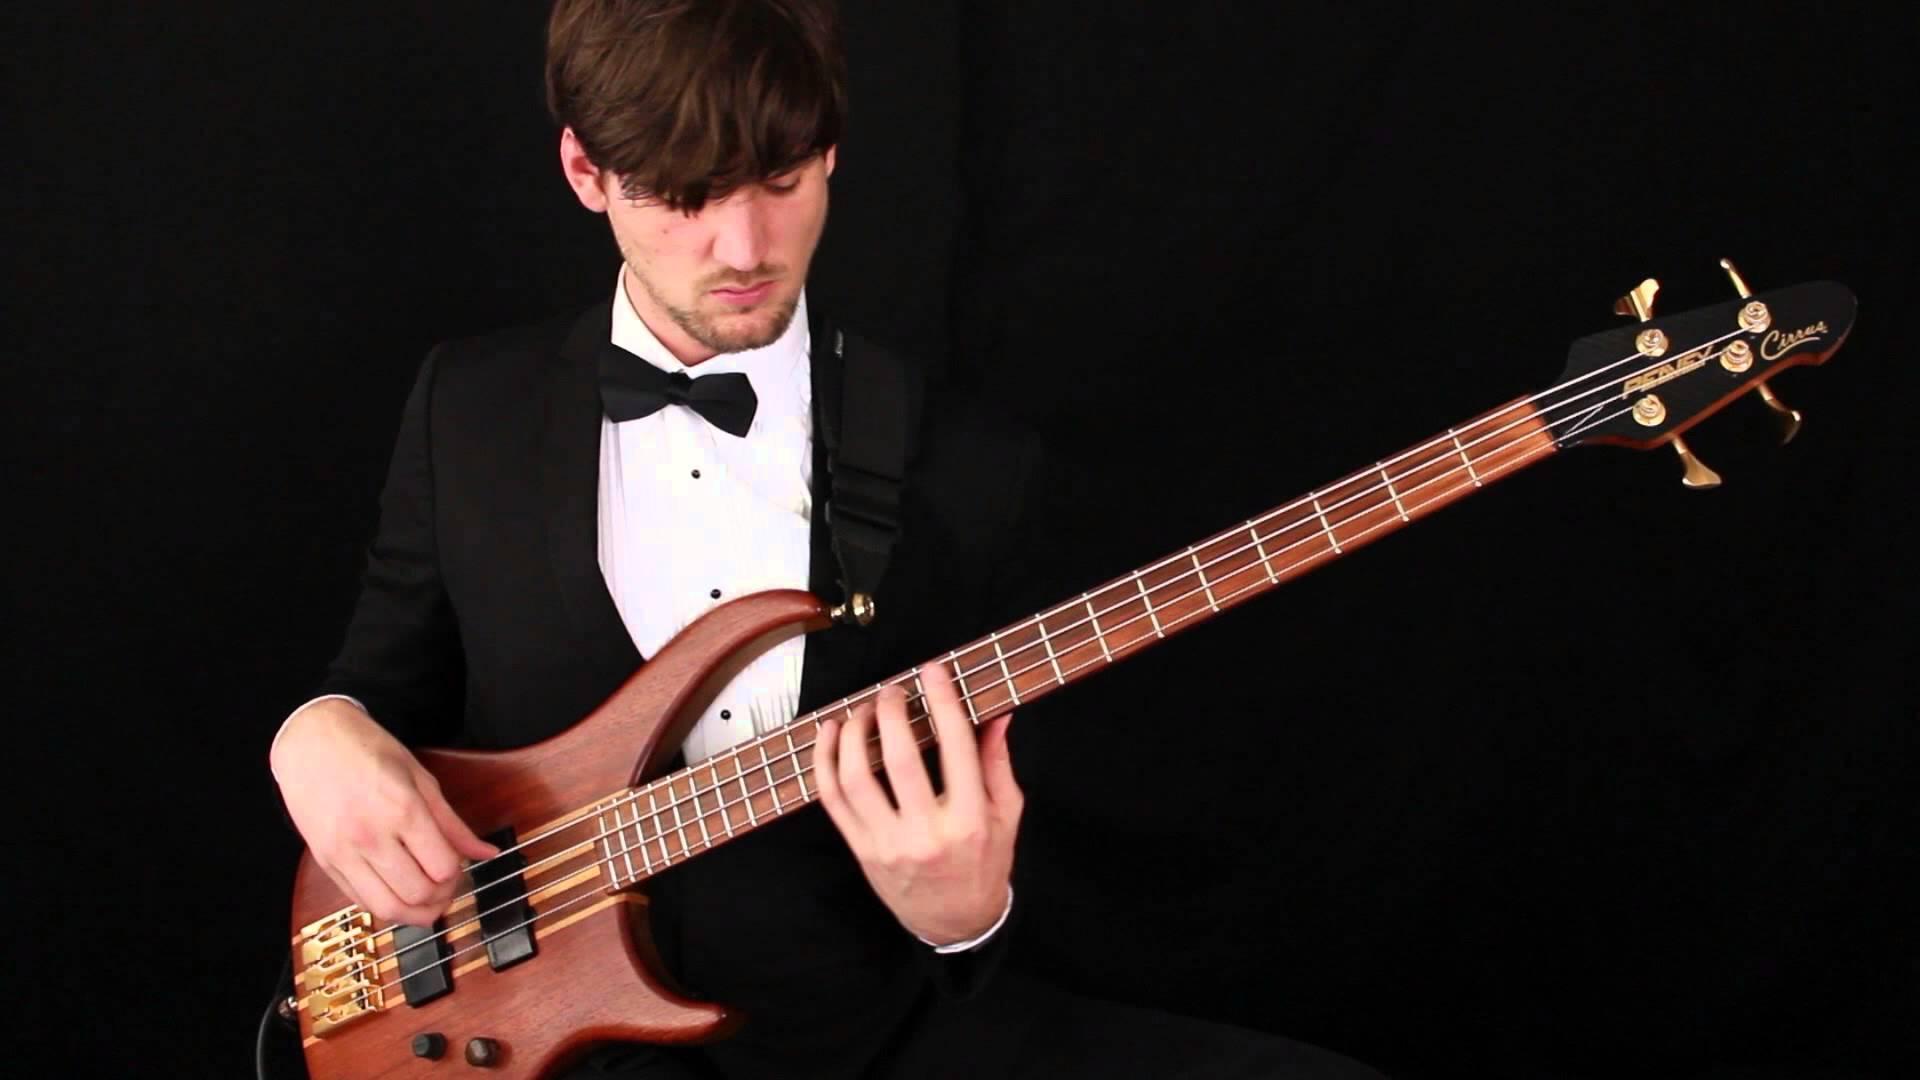 Tips for bass guitarists   Blog   Christofmusic.com